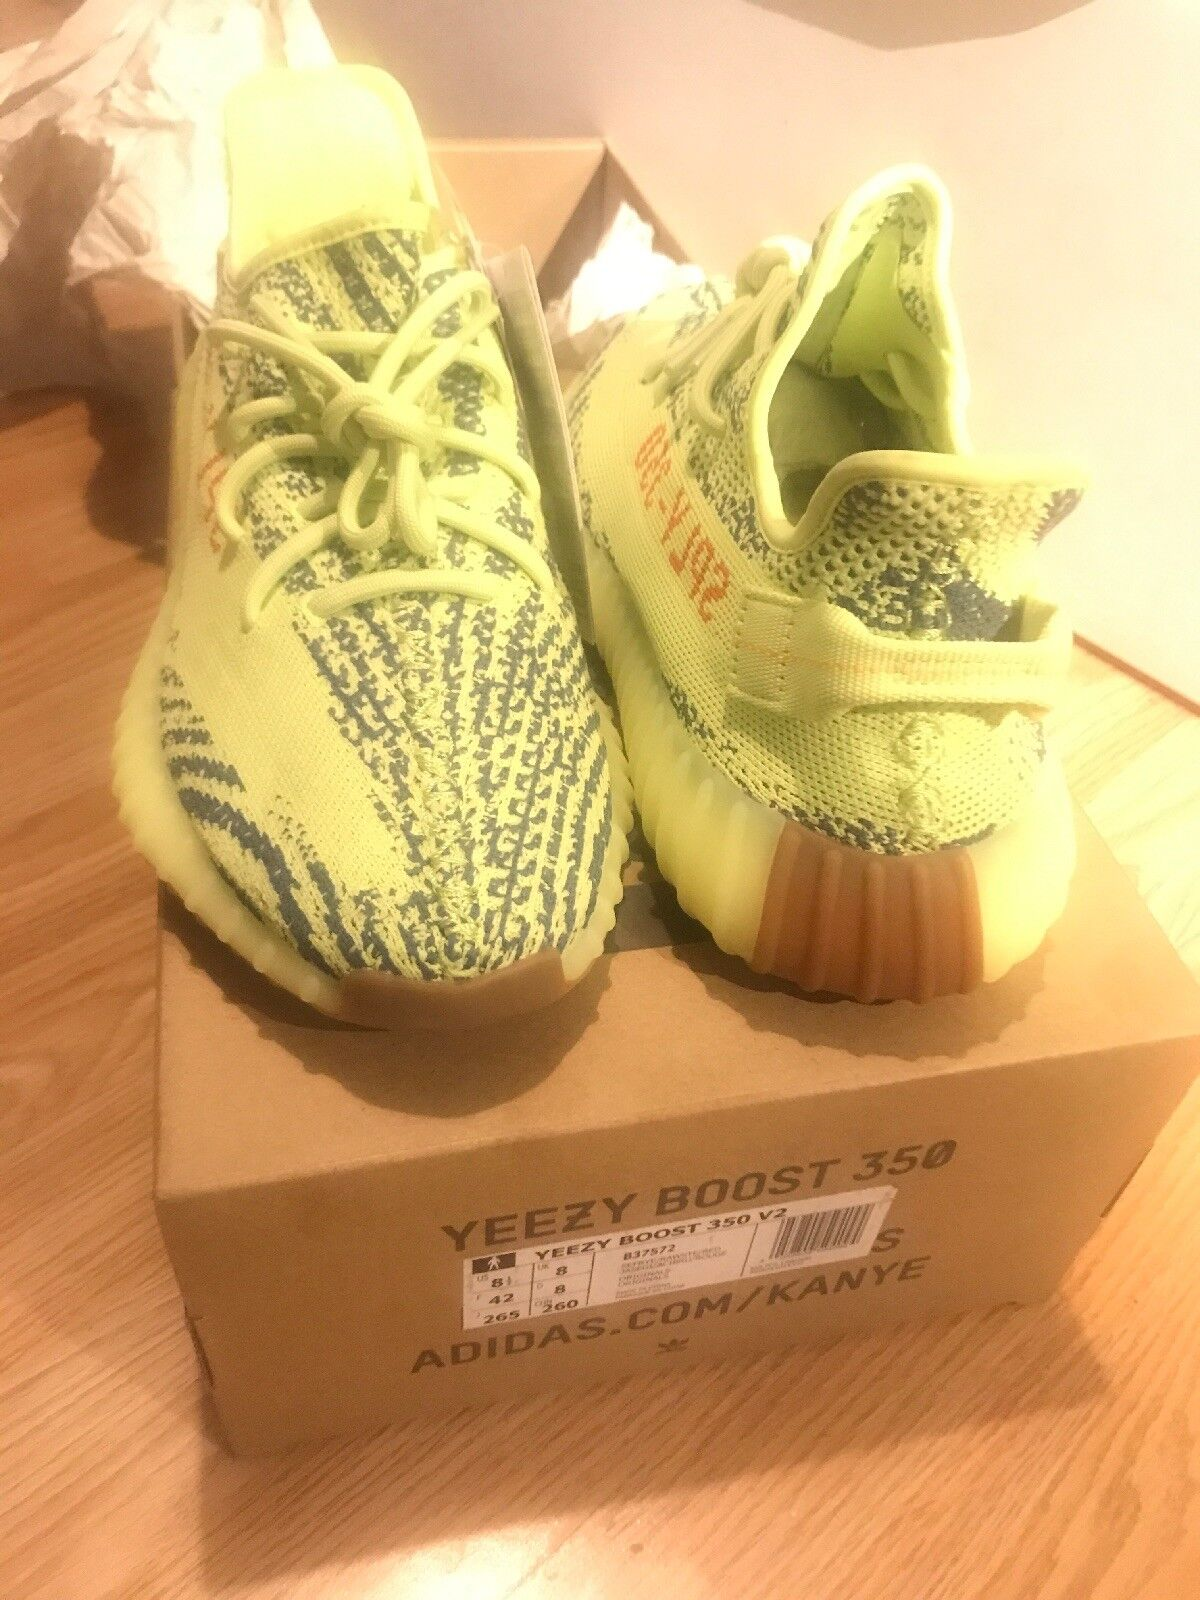 Adidas Yeezy Boost 350 V2 Semi Frozen Yellow Yebra